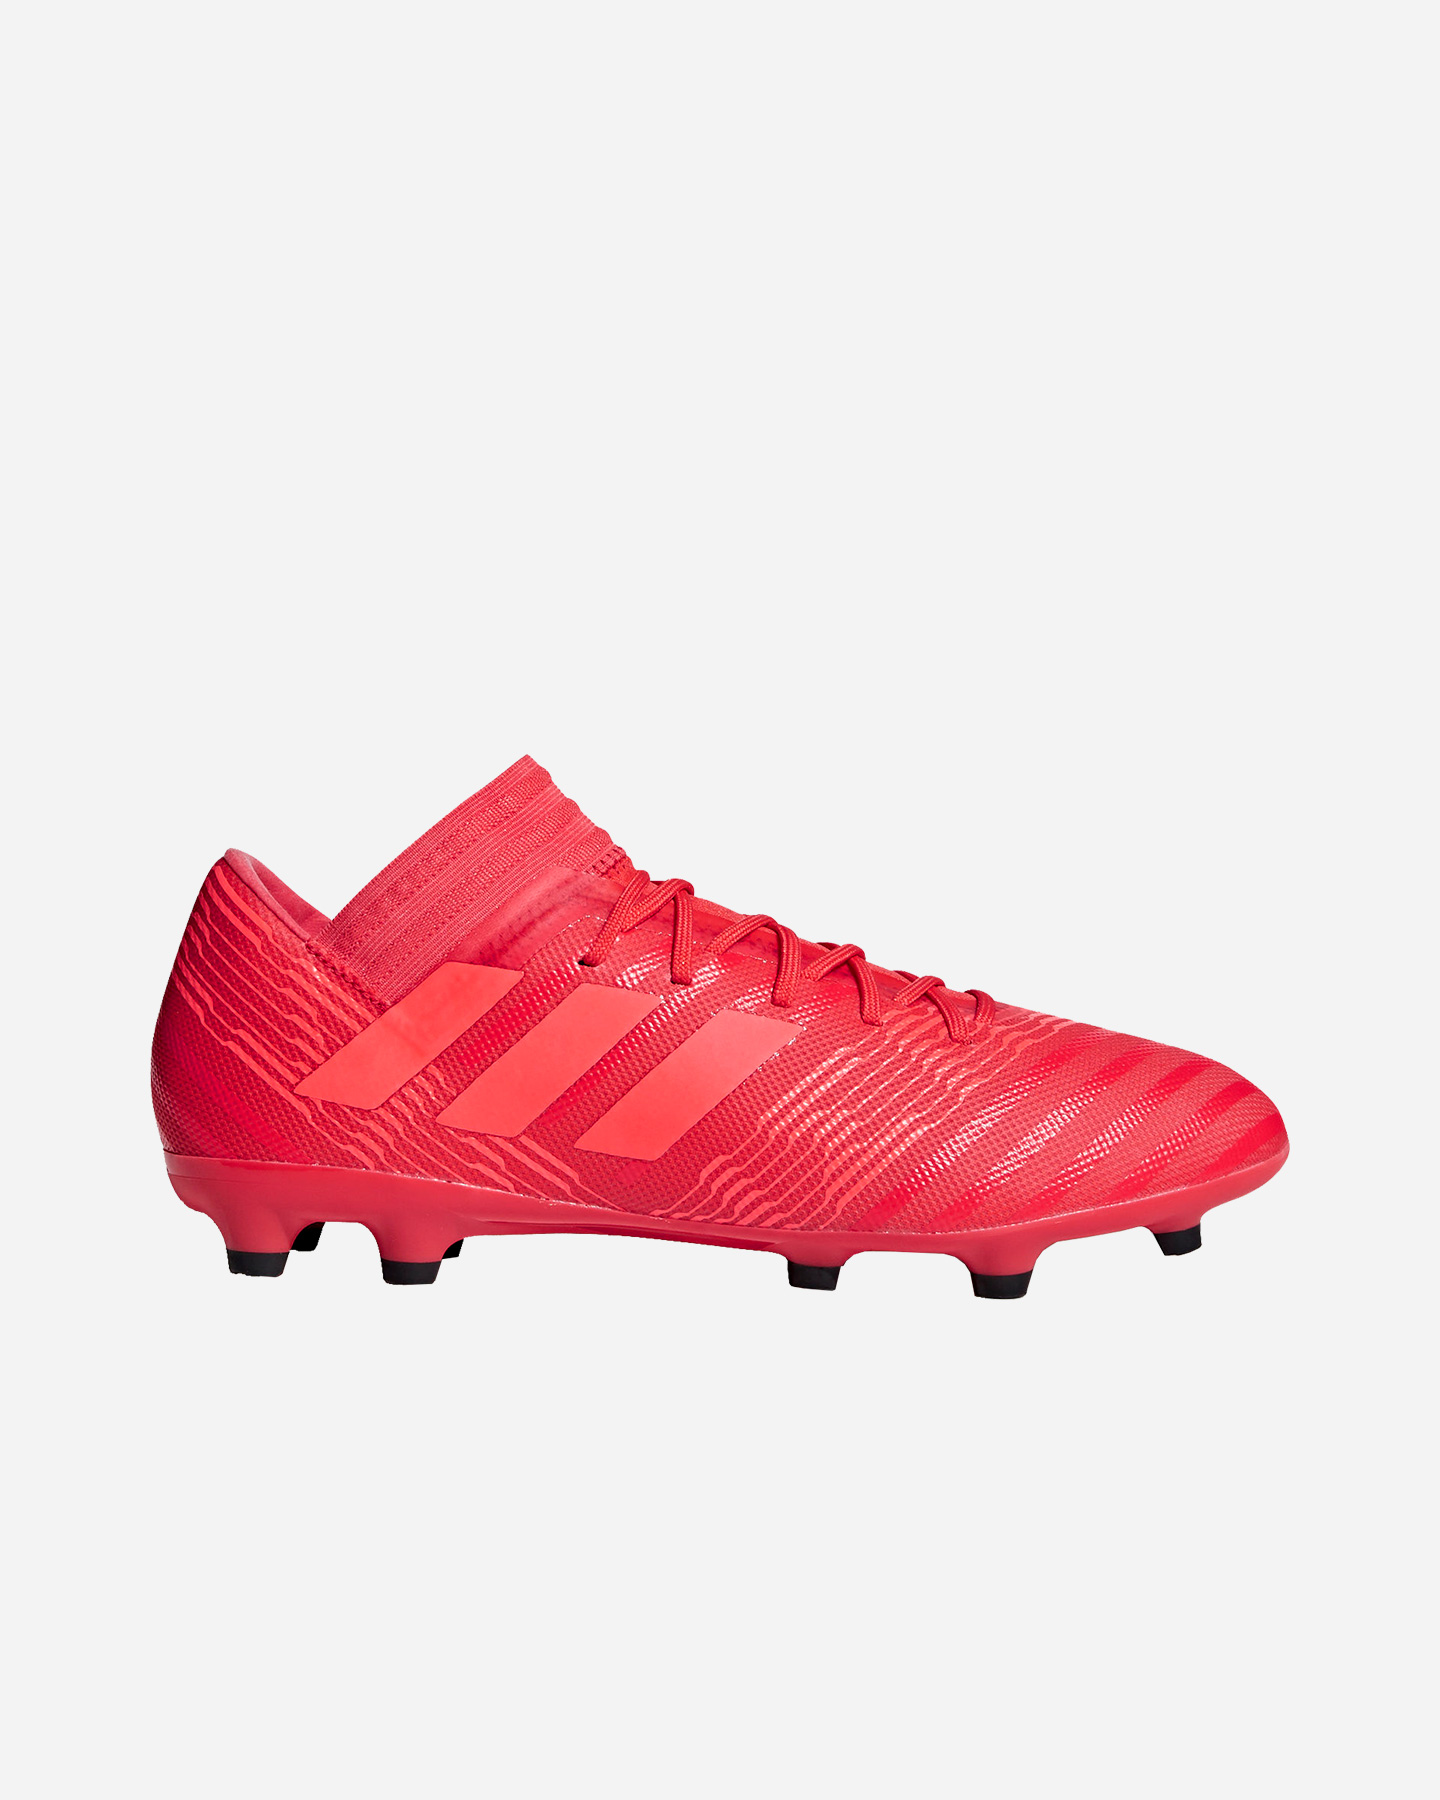 adidas calcio scarpe nemeziz